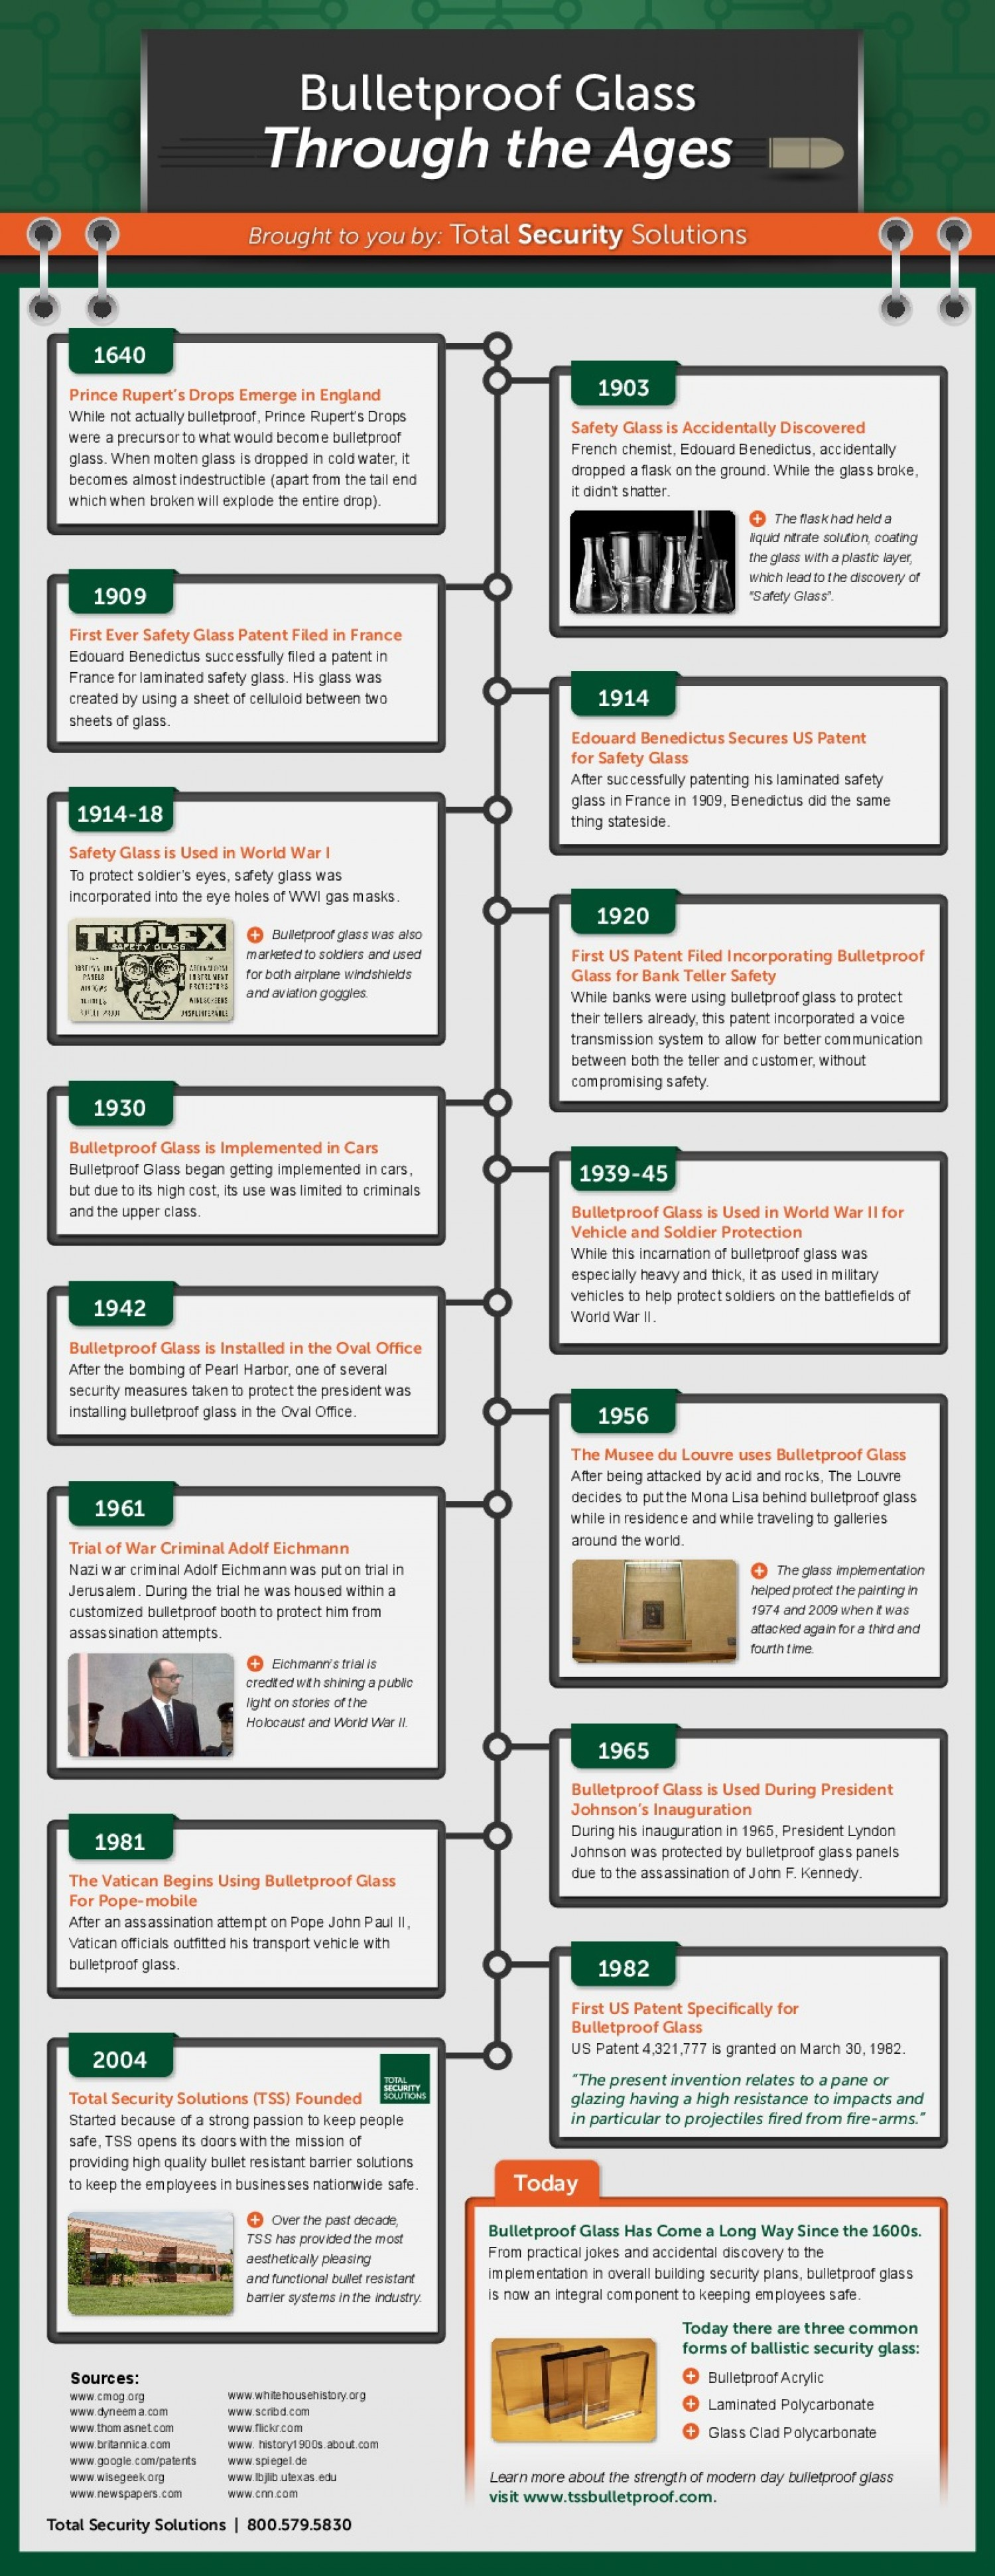 History of Bulletproof Glass